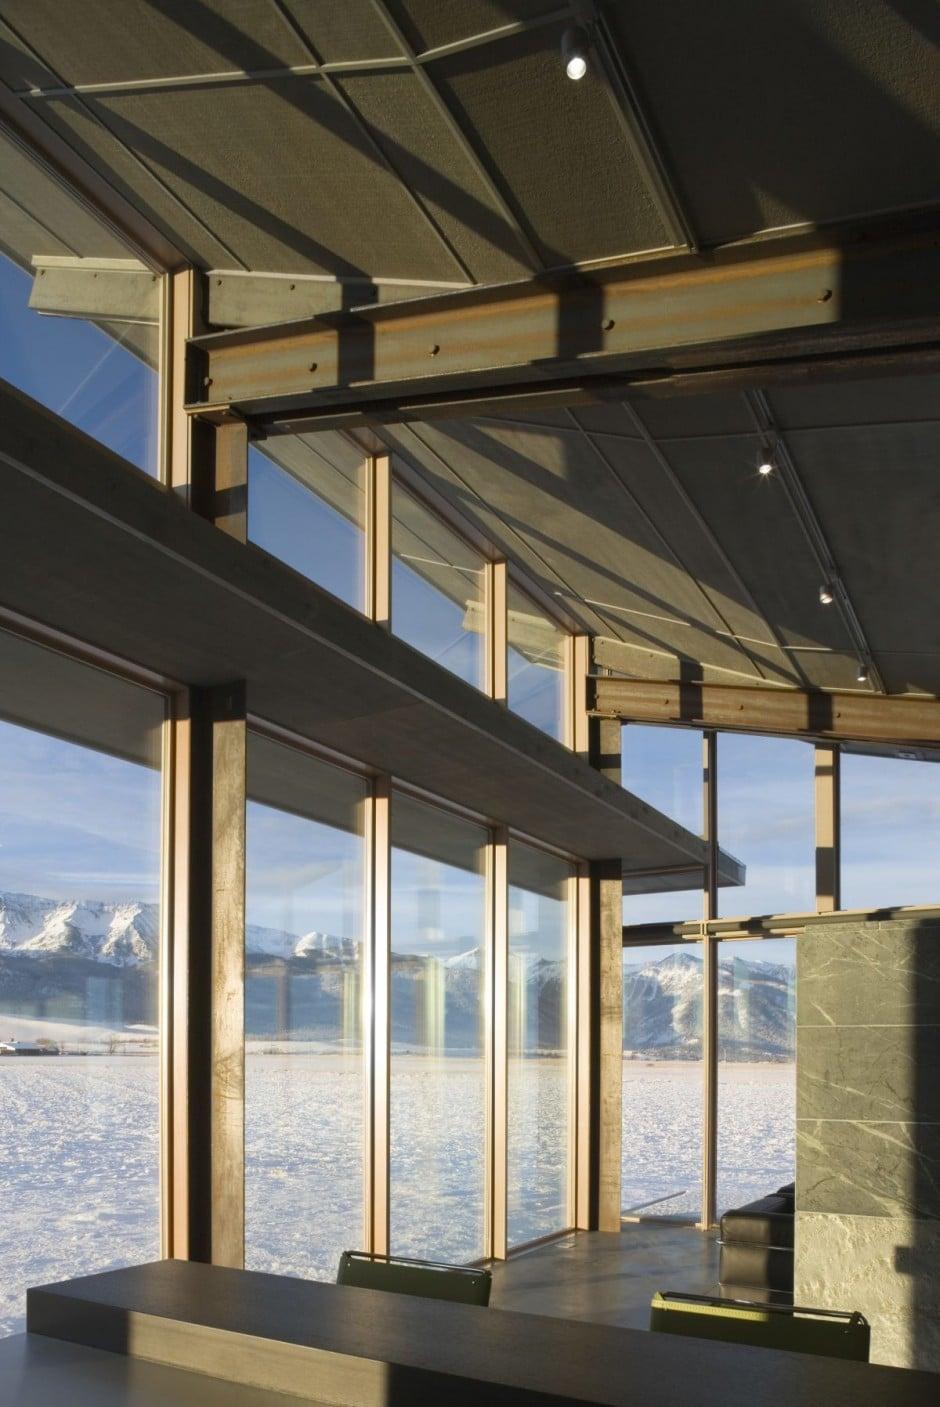 Interior window frames - Dise 241 O De Moderna Casa Peque 241 A Con Grandes Ventanas